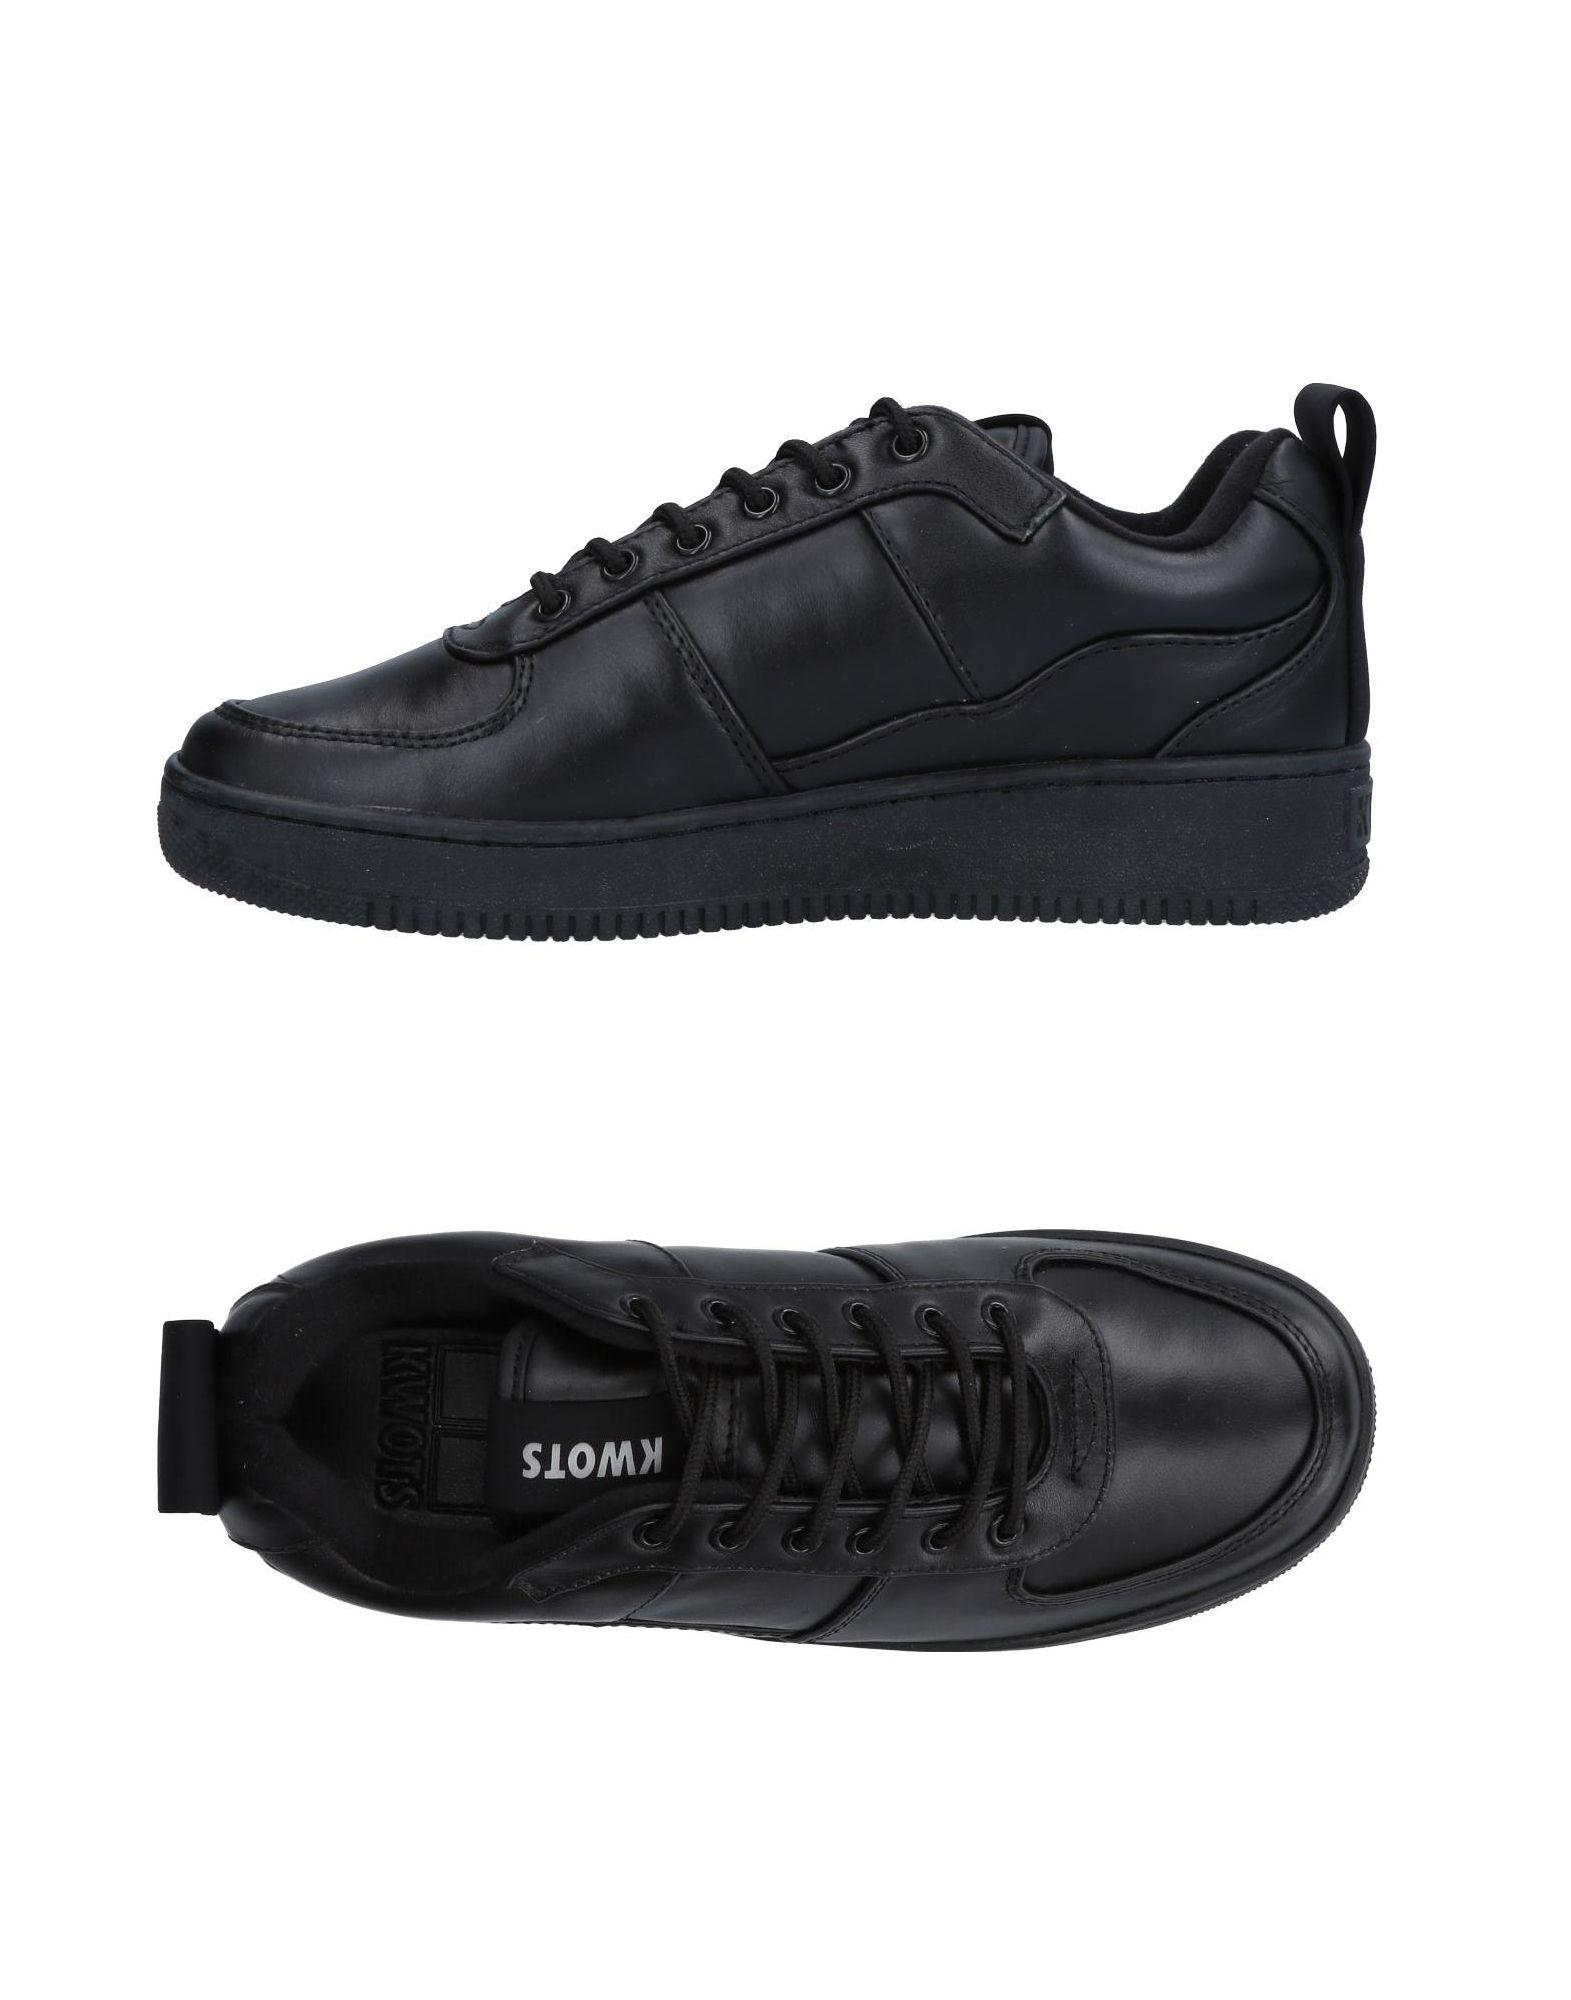 Rabatt echte Sneakers Schuhe Kwots Sneakers echte Herren  11490996UJ 2abb7e